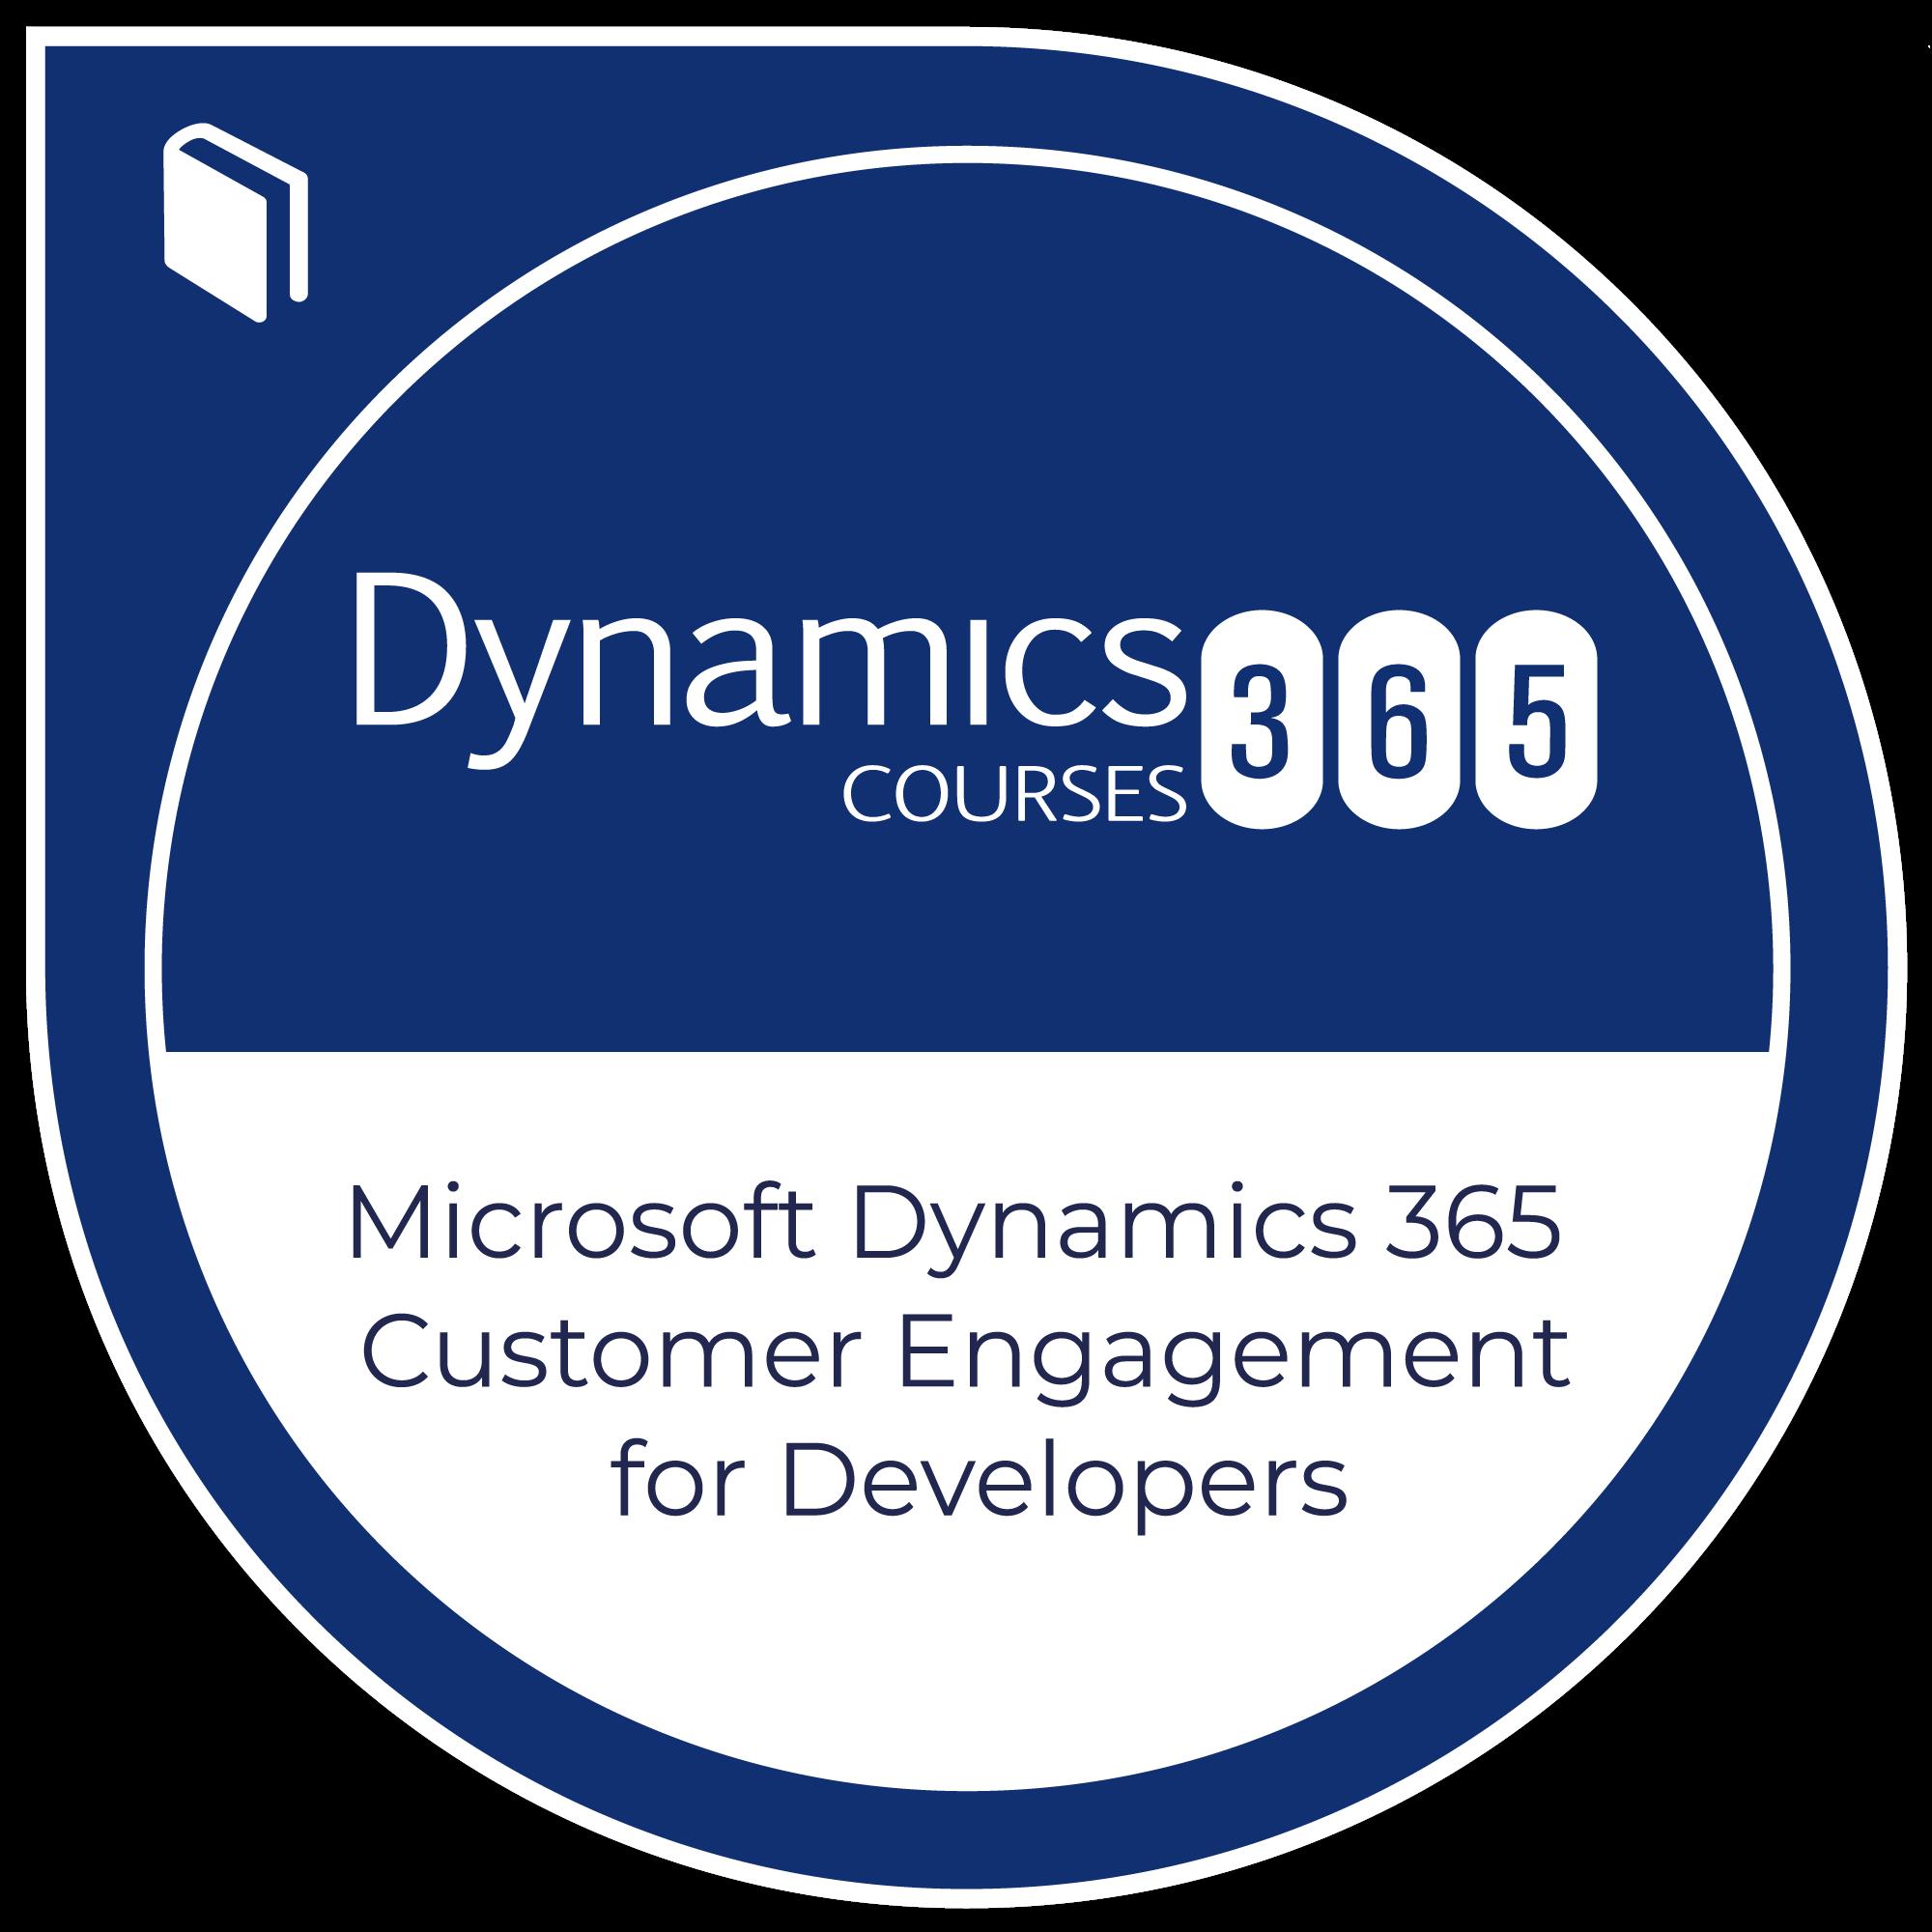 Microsoft Dynamics 365 Customer Engagement for Developers